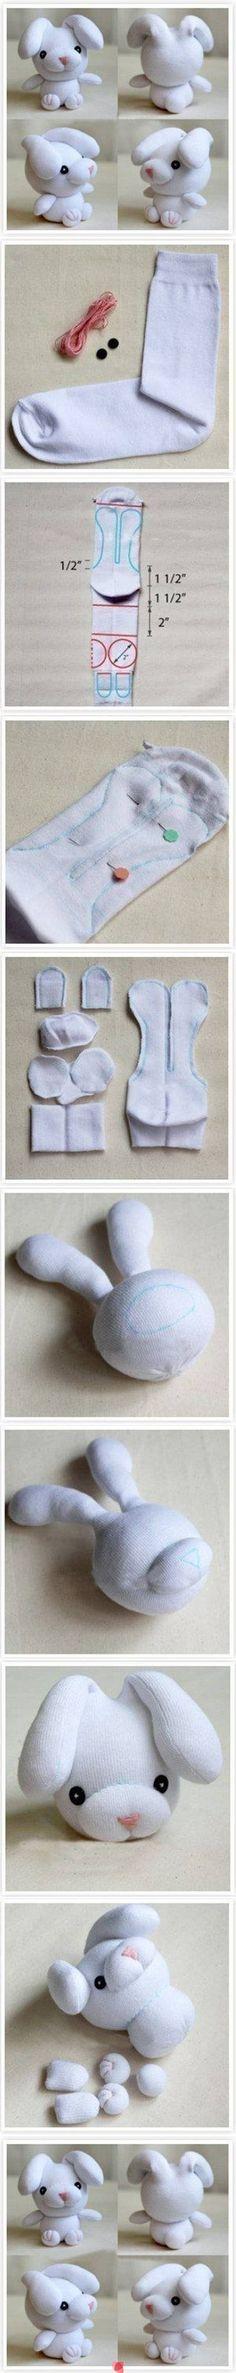 Oh, so cute.  White sock toys.